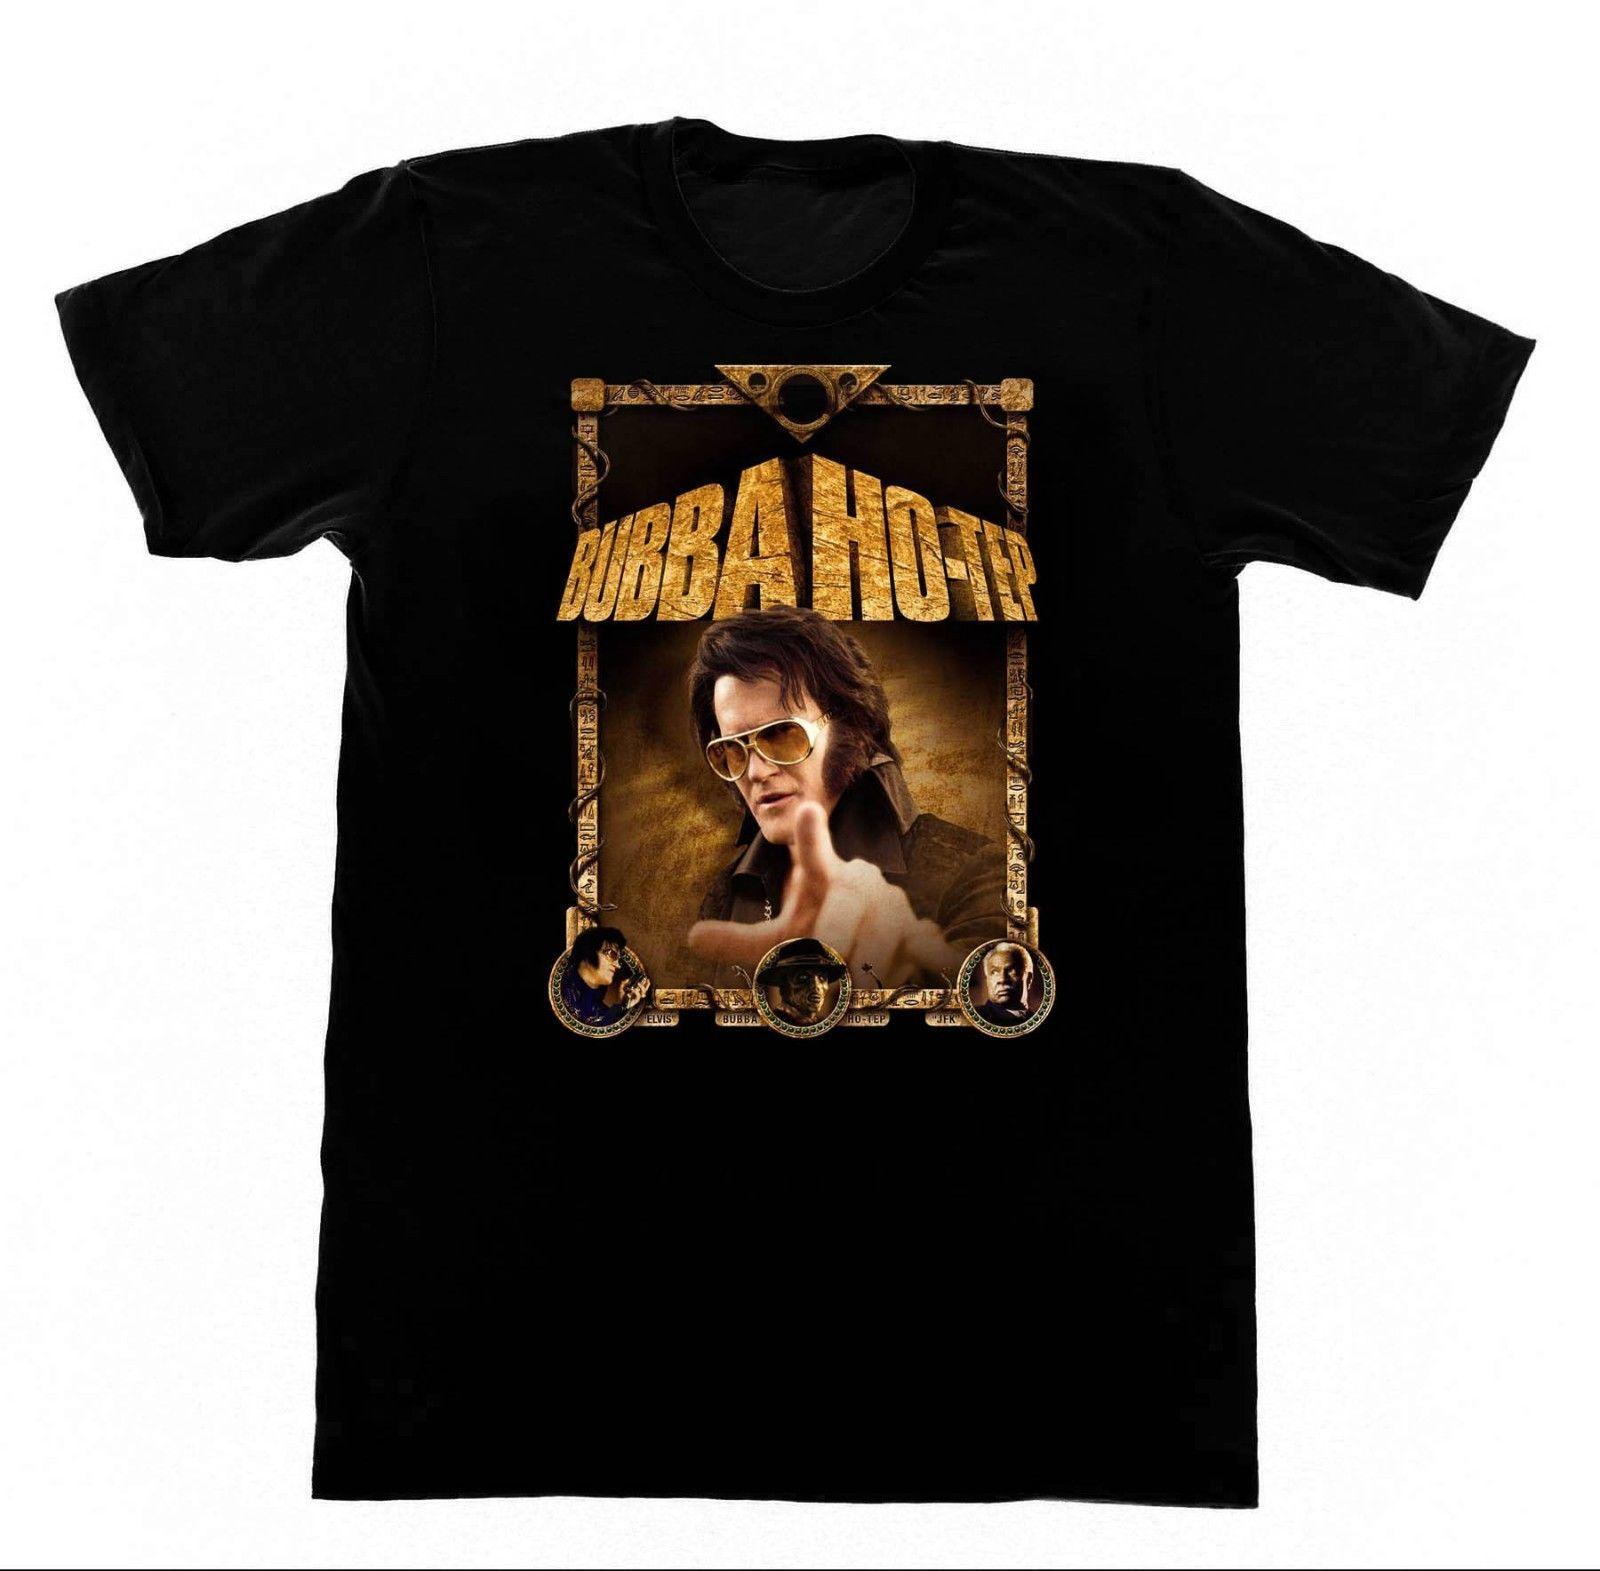 Bubba Ho - Tep T Shirt 91 T-shirt Hotep Bruce Campbell Evil Dead Army Of Darkness Maniche corte New Fashion T-shirt Abbigliamento uomo